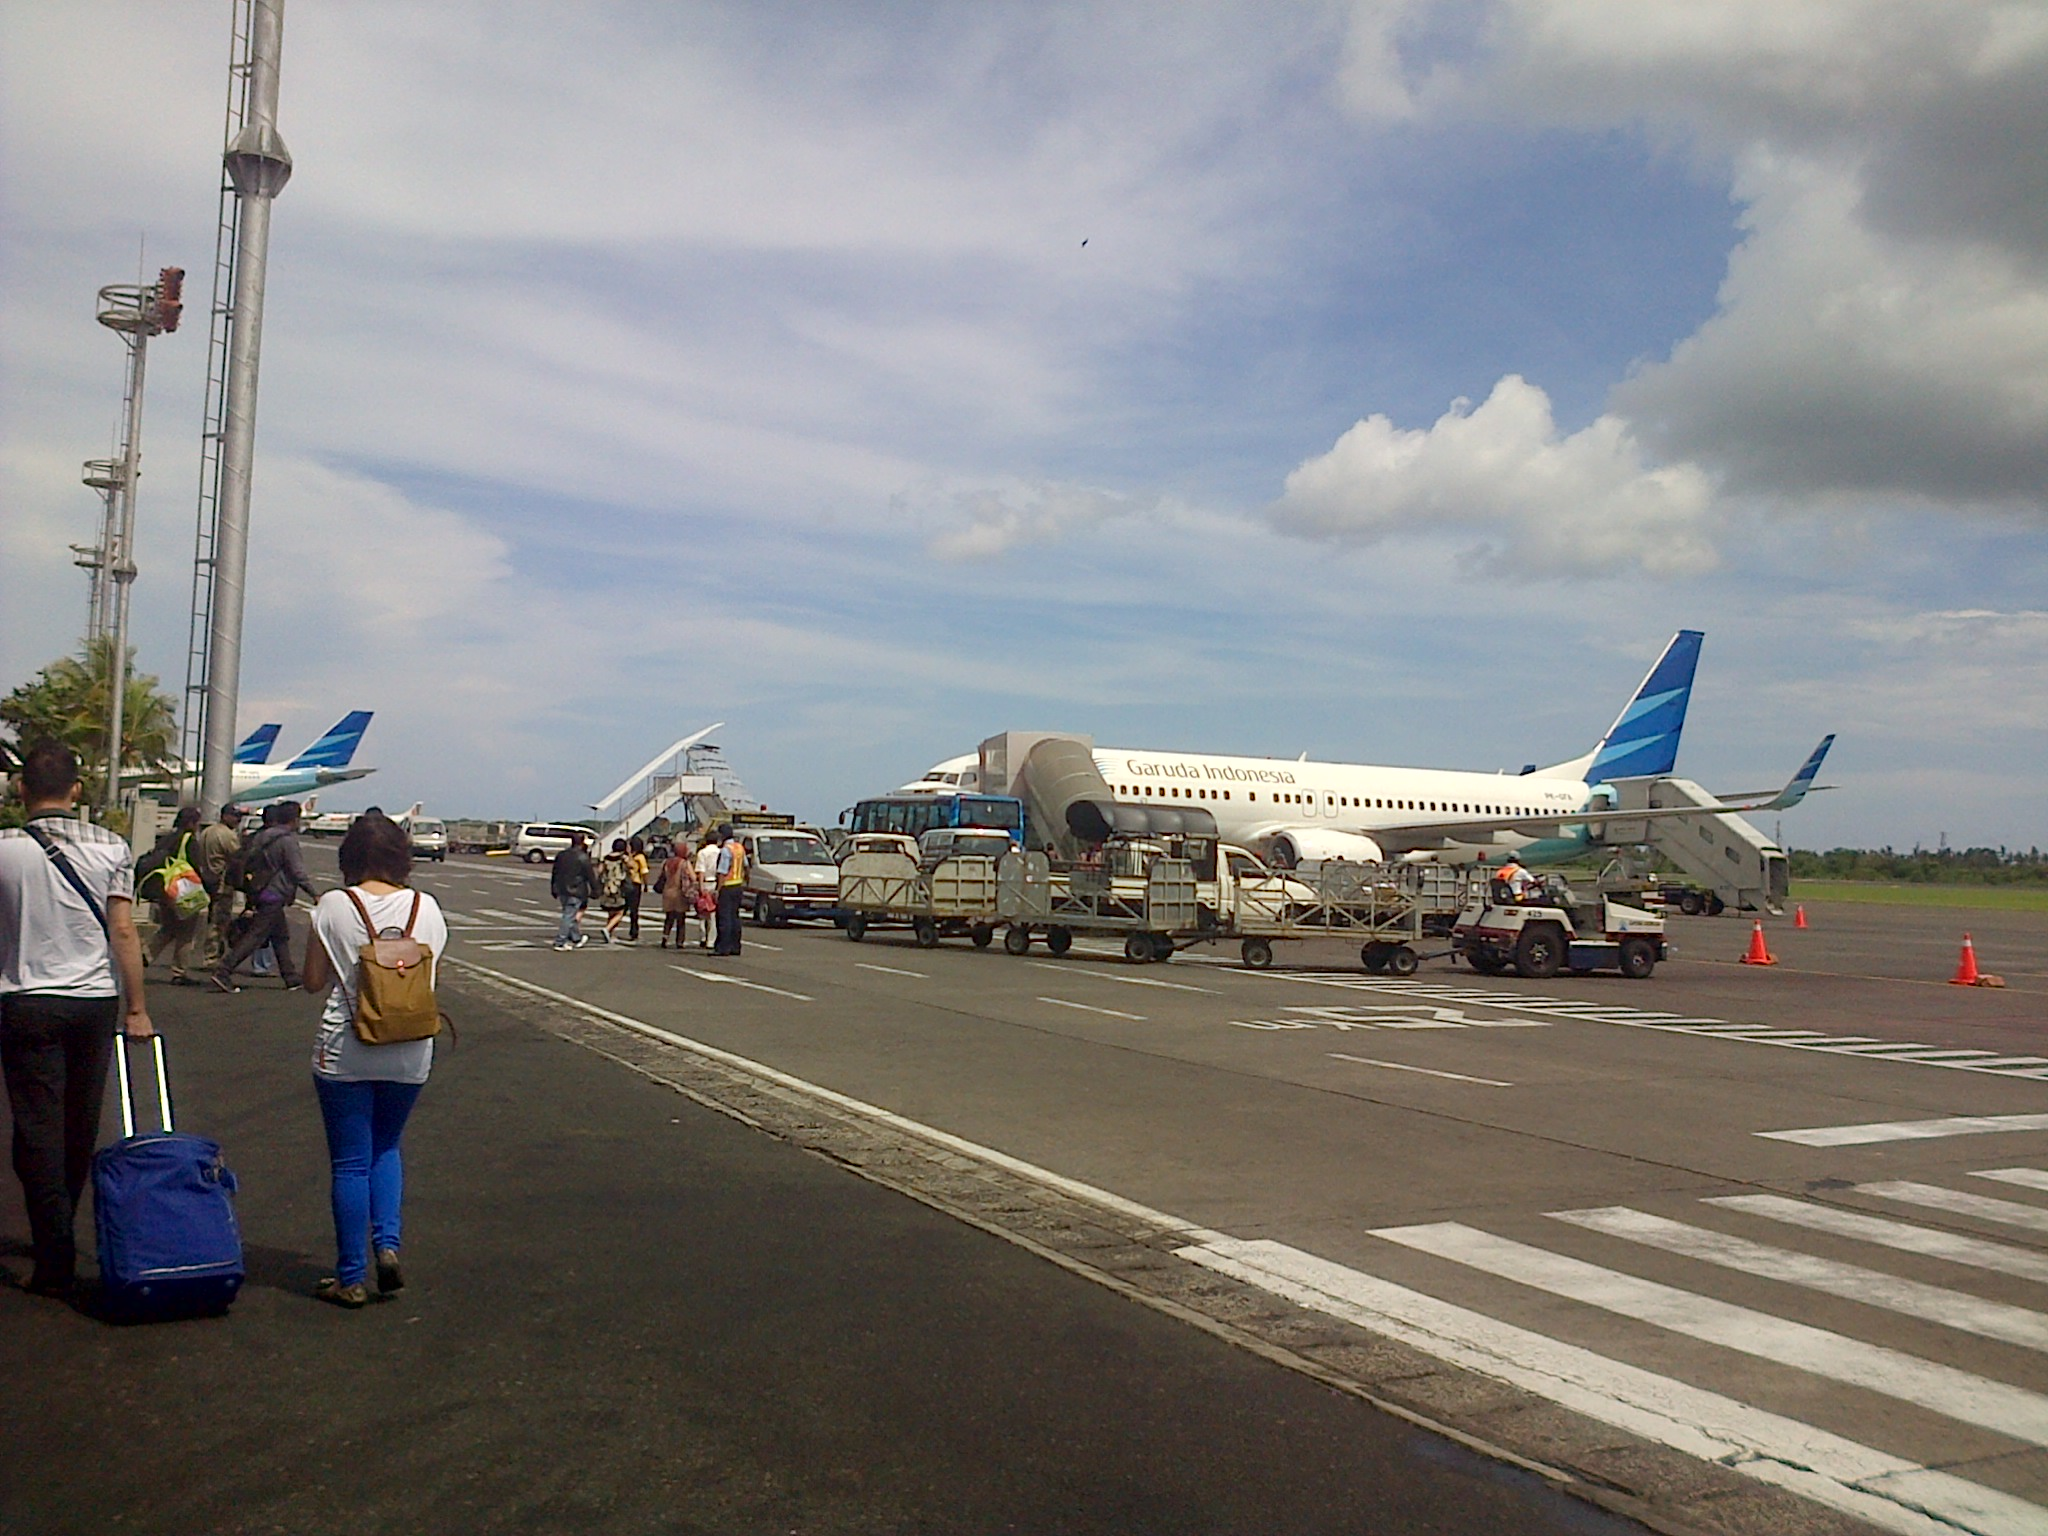 Aeroporto Bali : File bali airport ngurah rai international airport denpasar